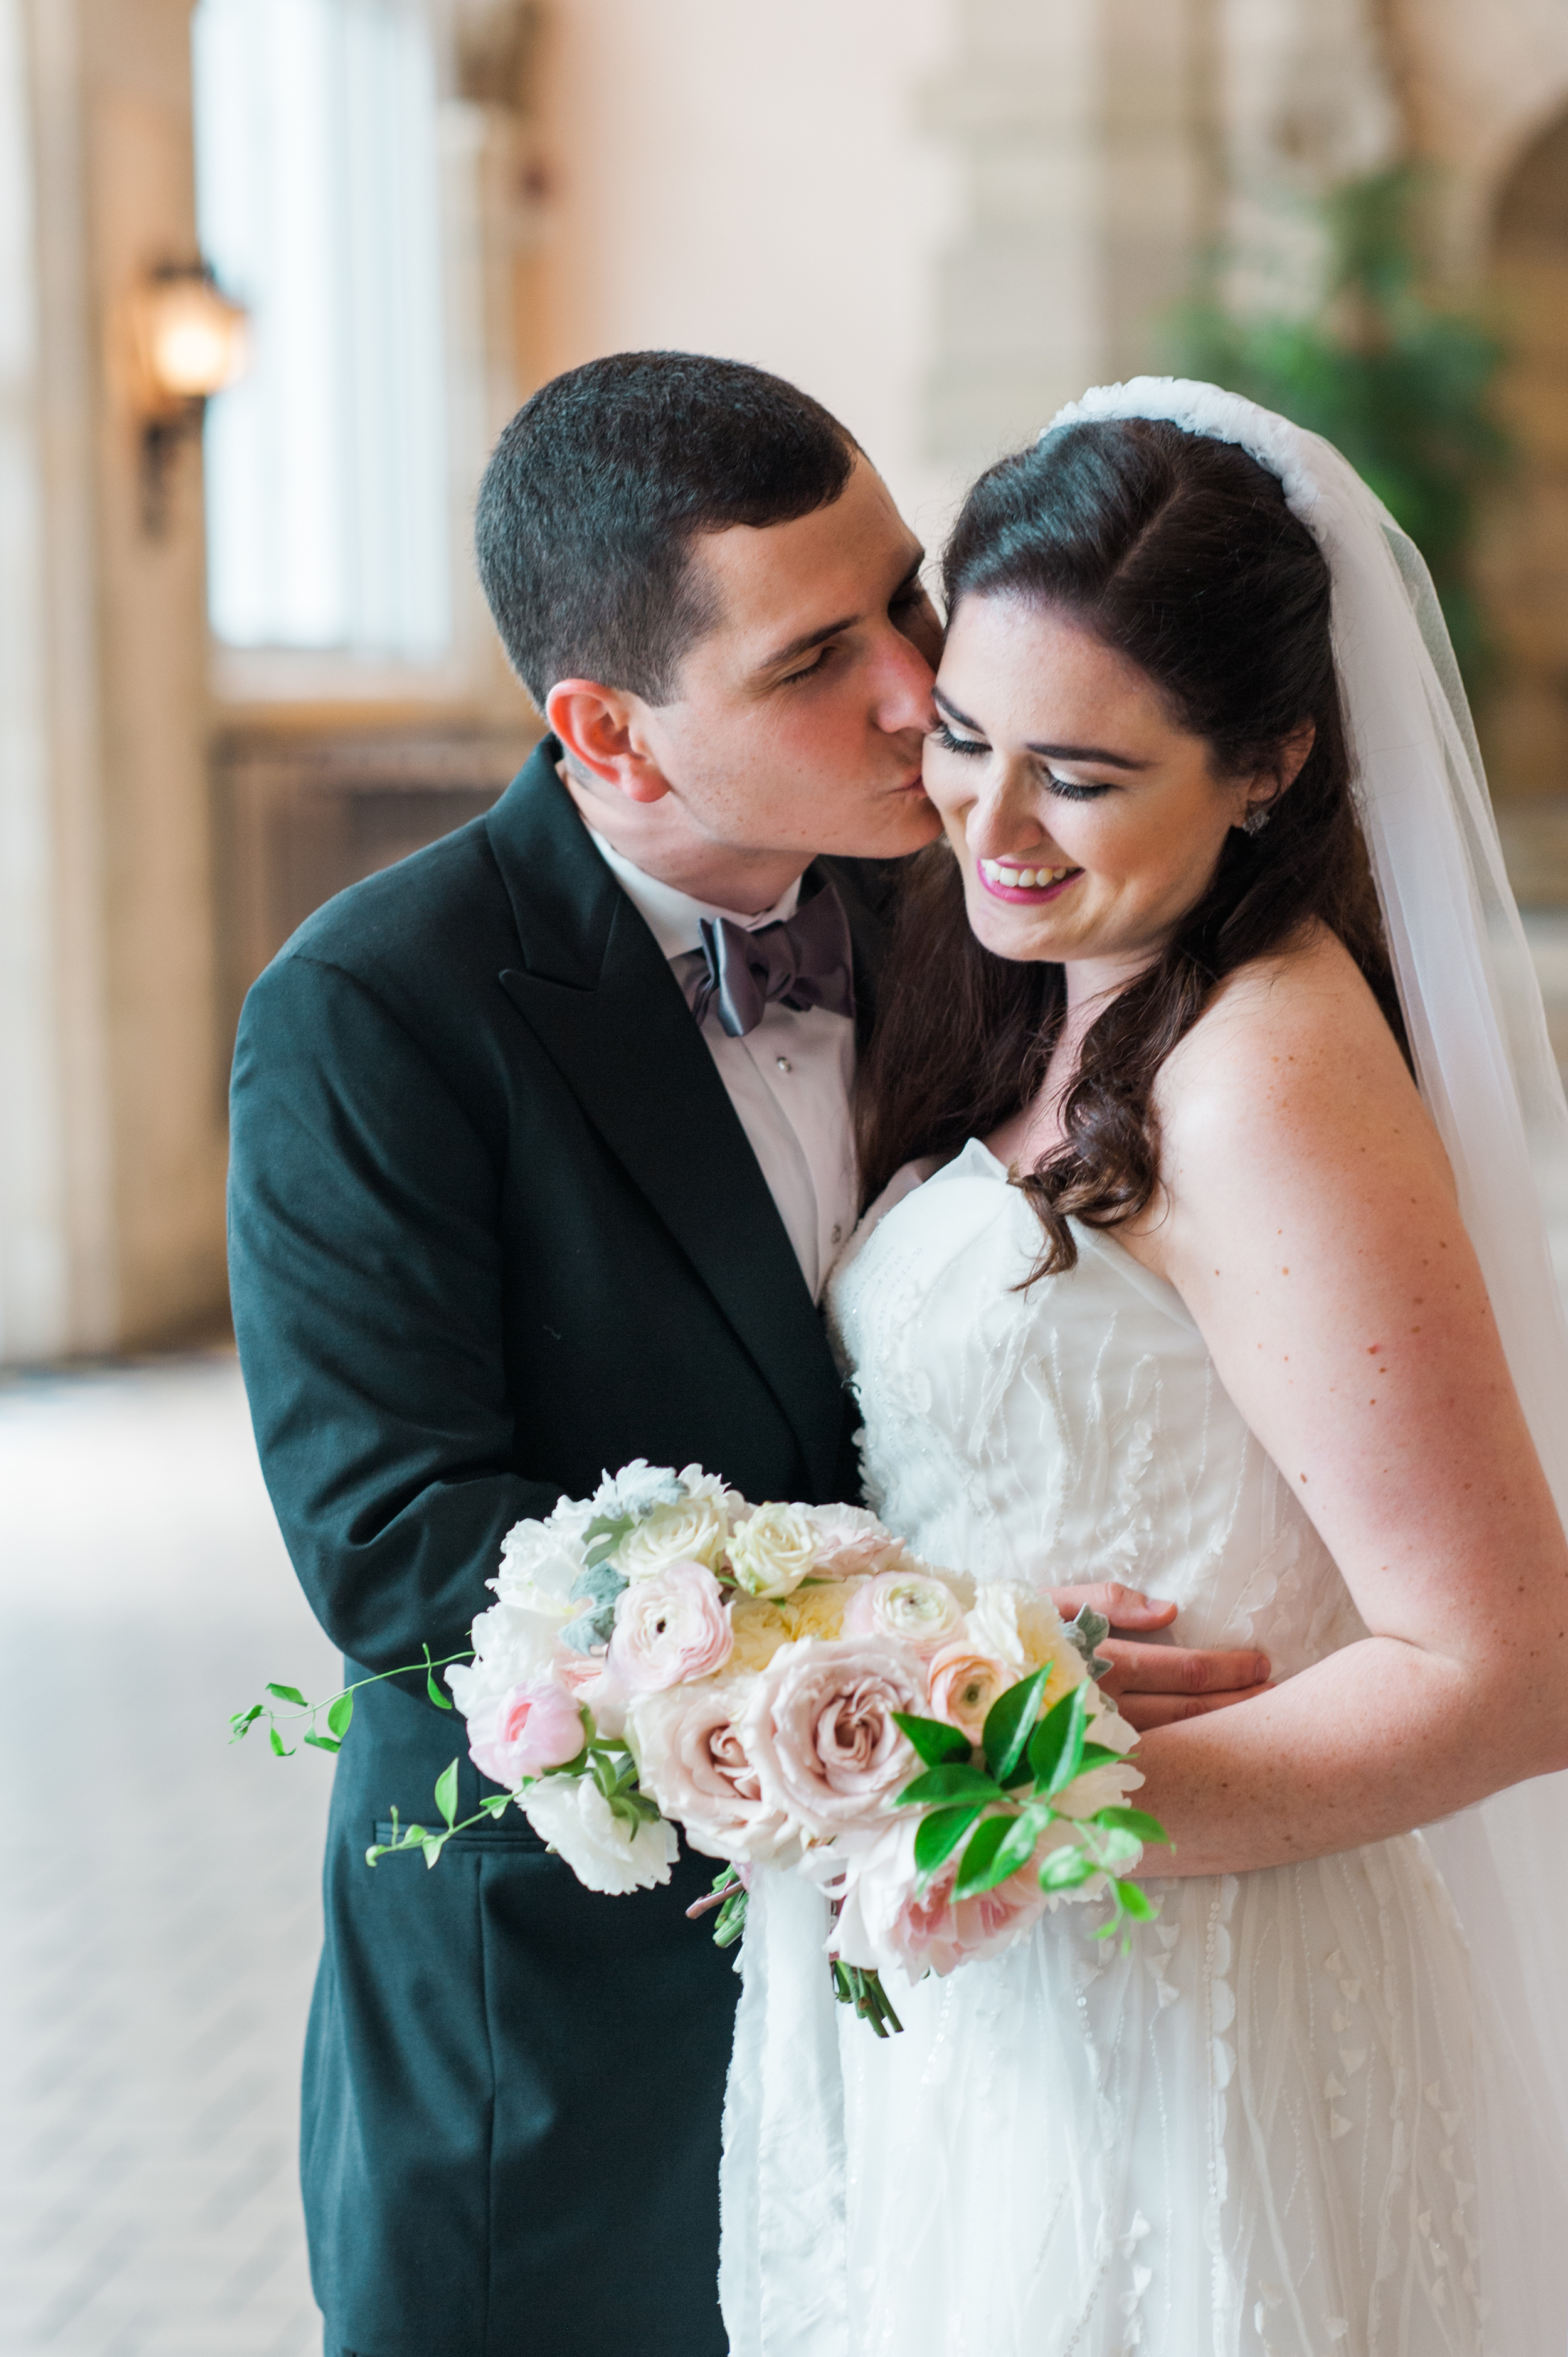 bridal-bouquet-design.jpg